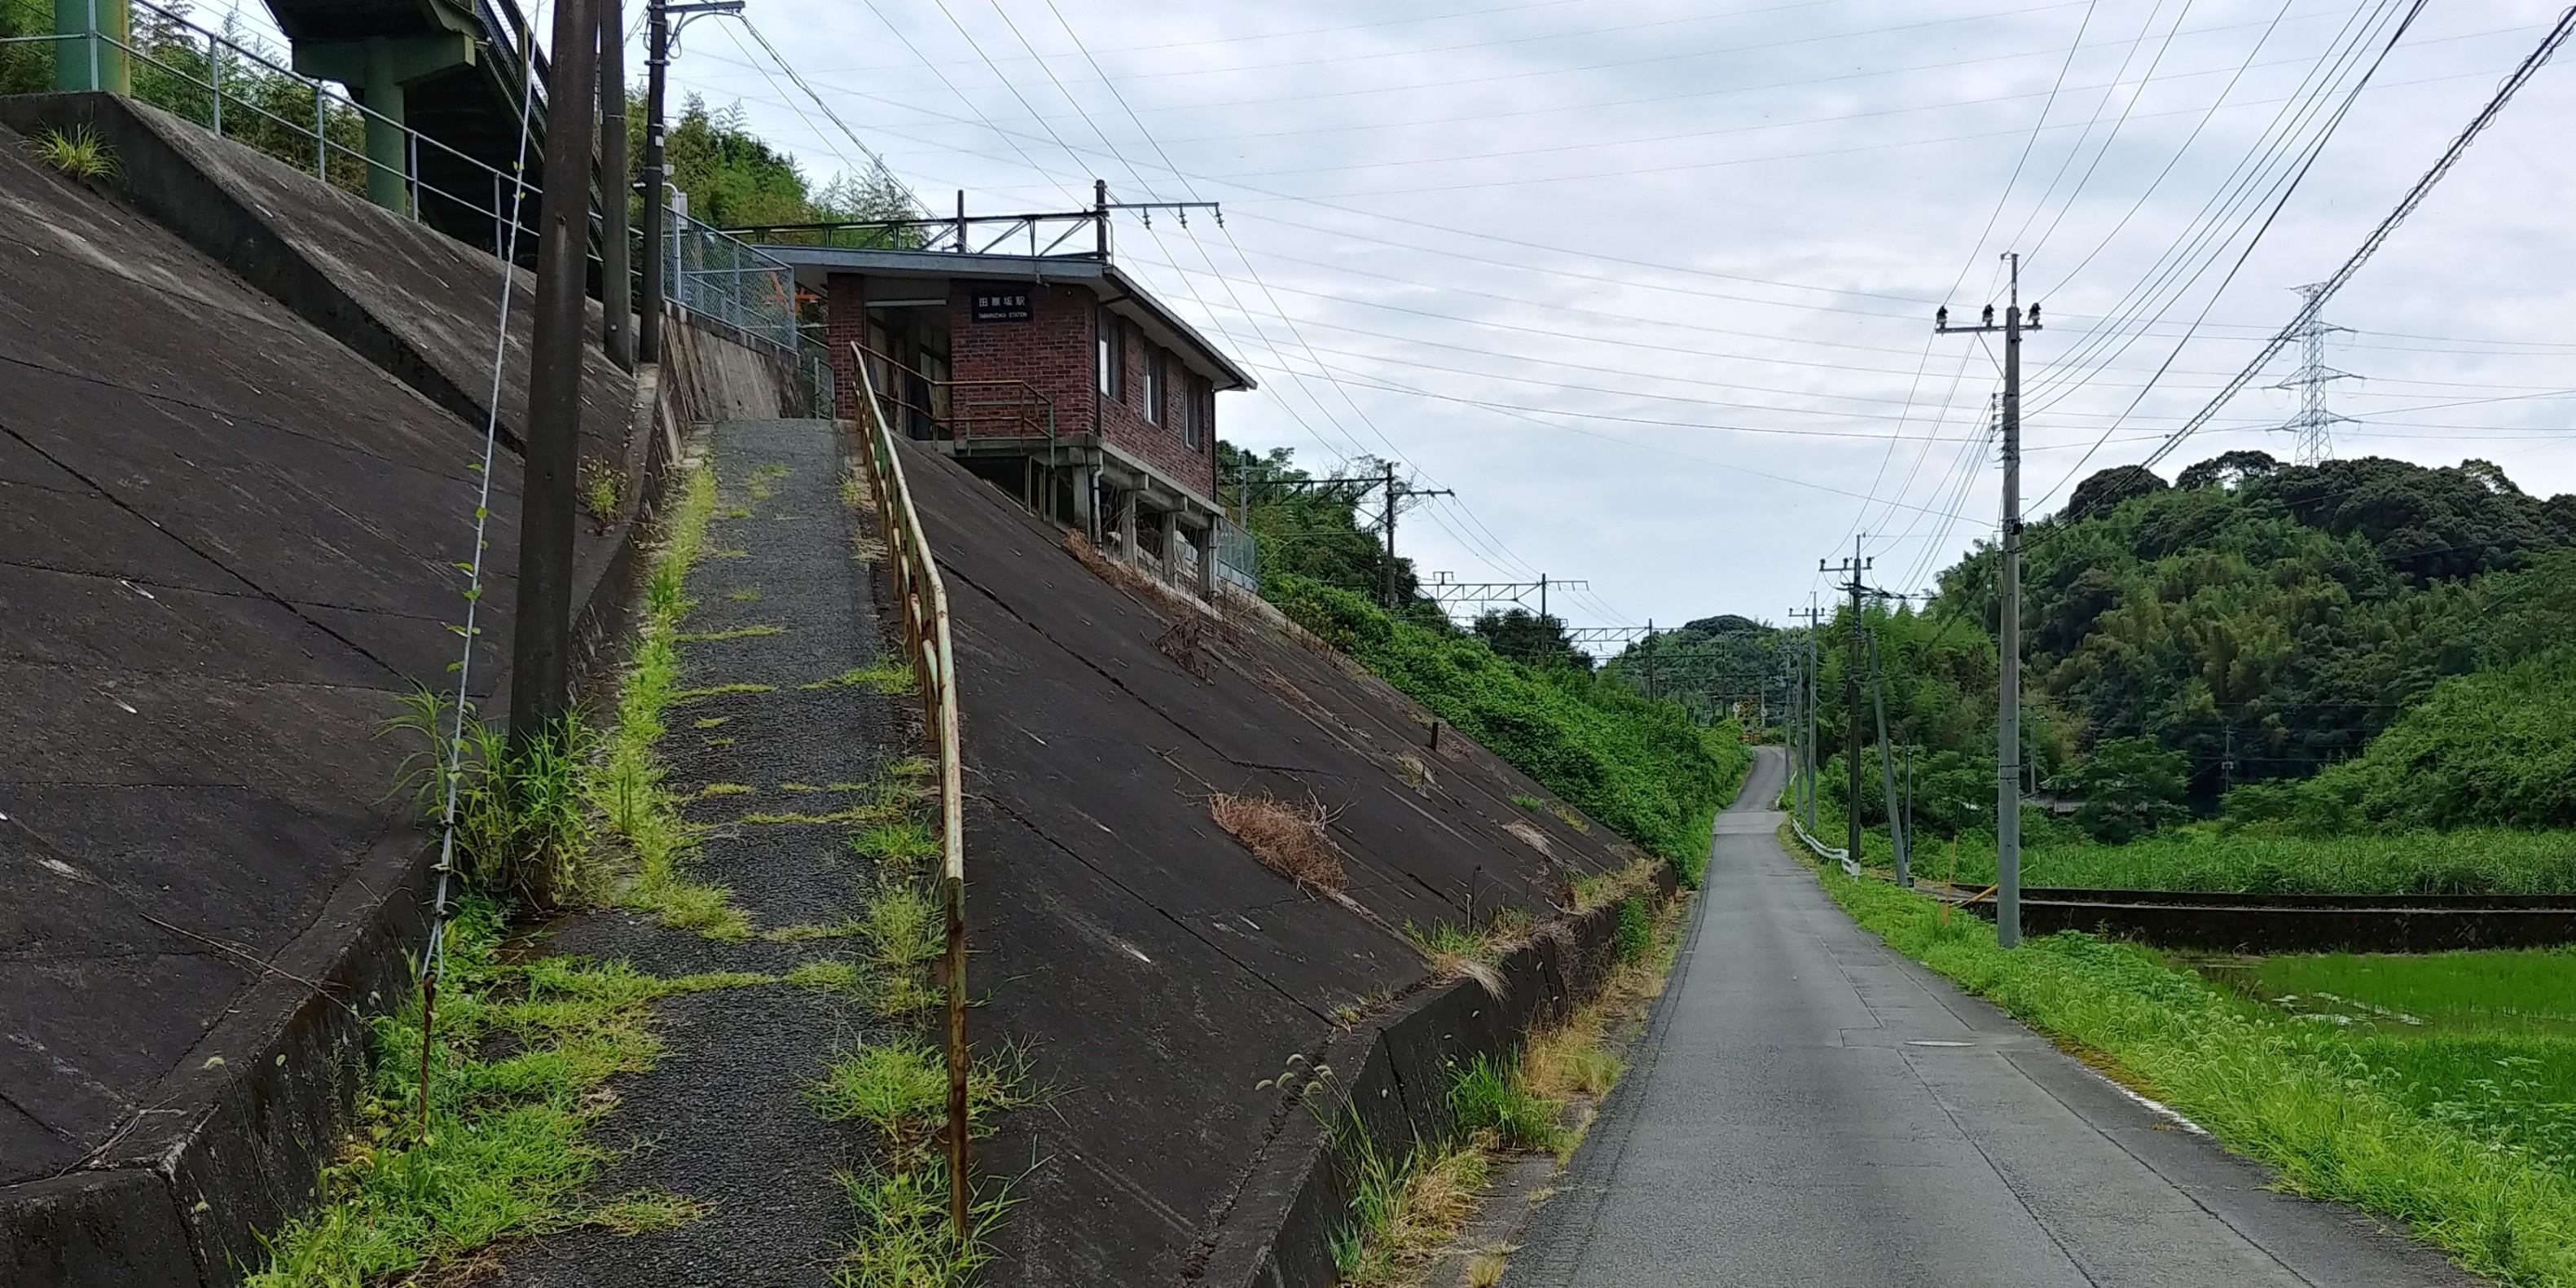 f:id:kishuji-kaisoku:20200216102517j:image